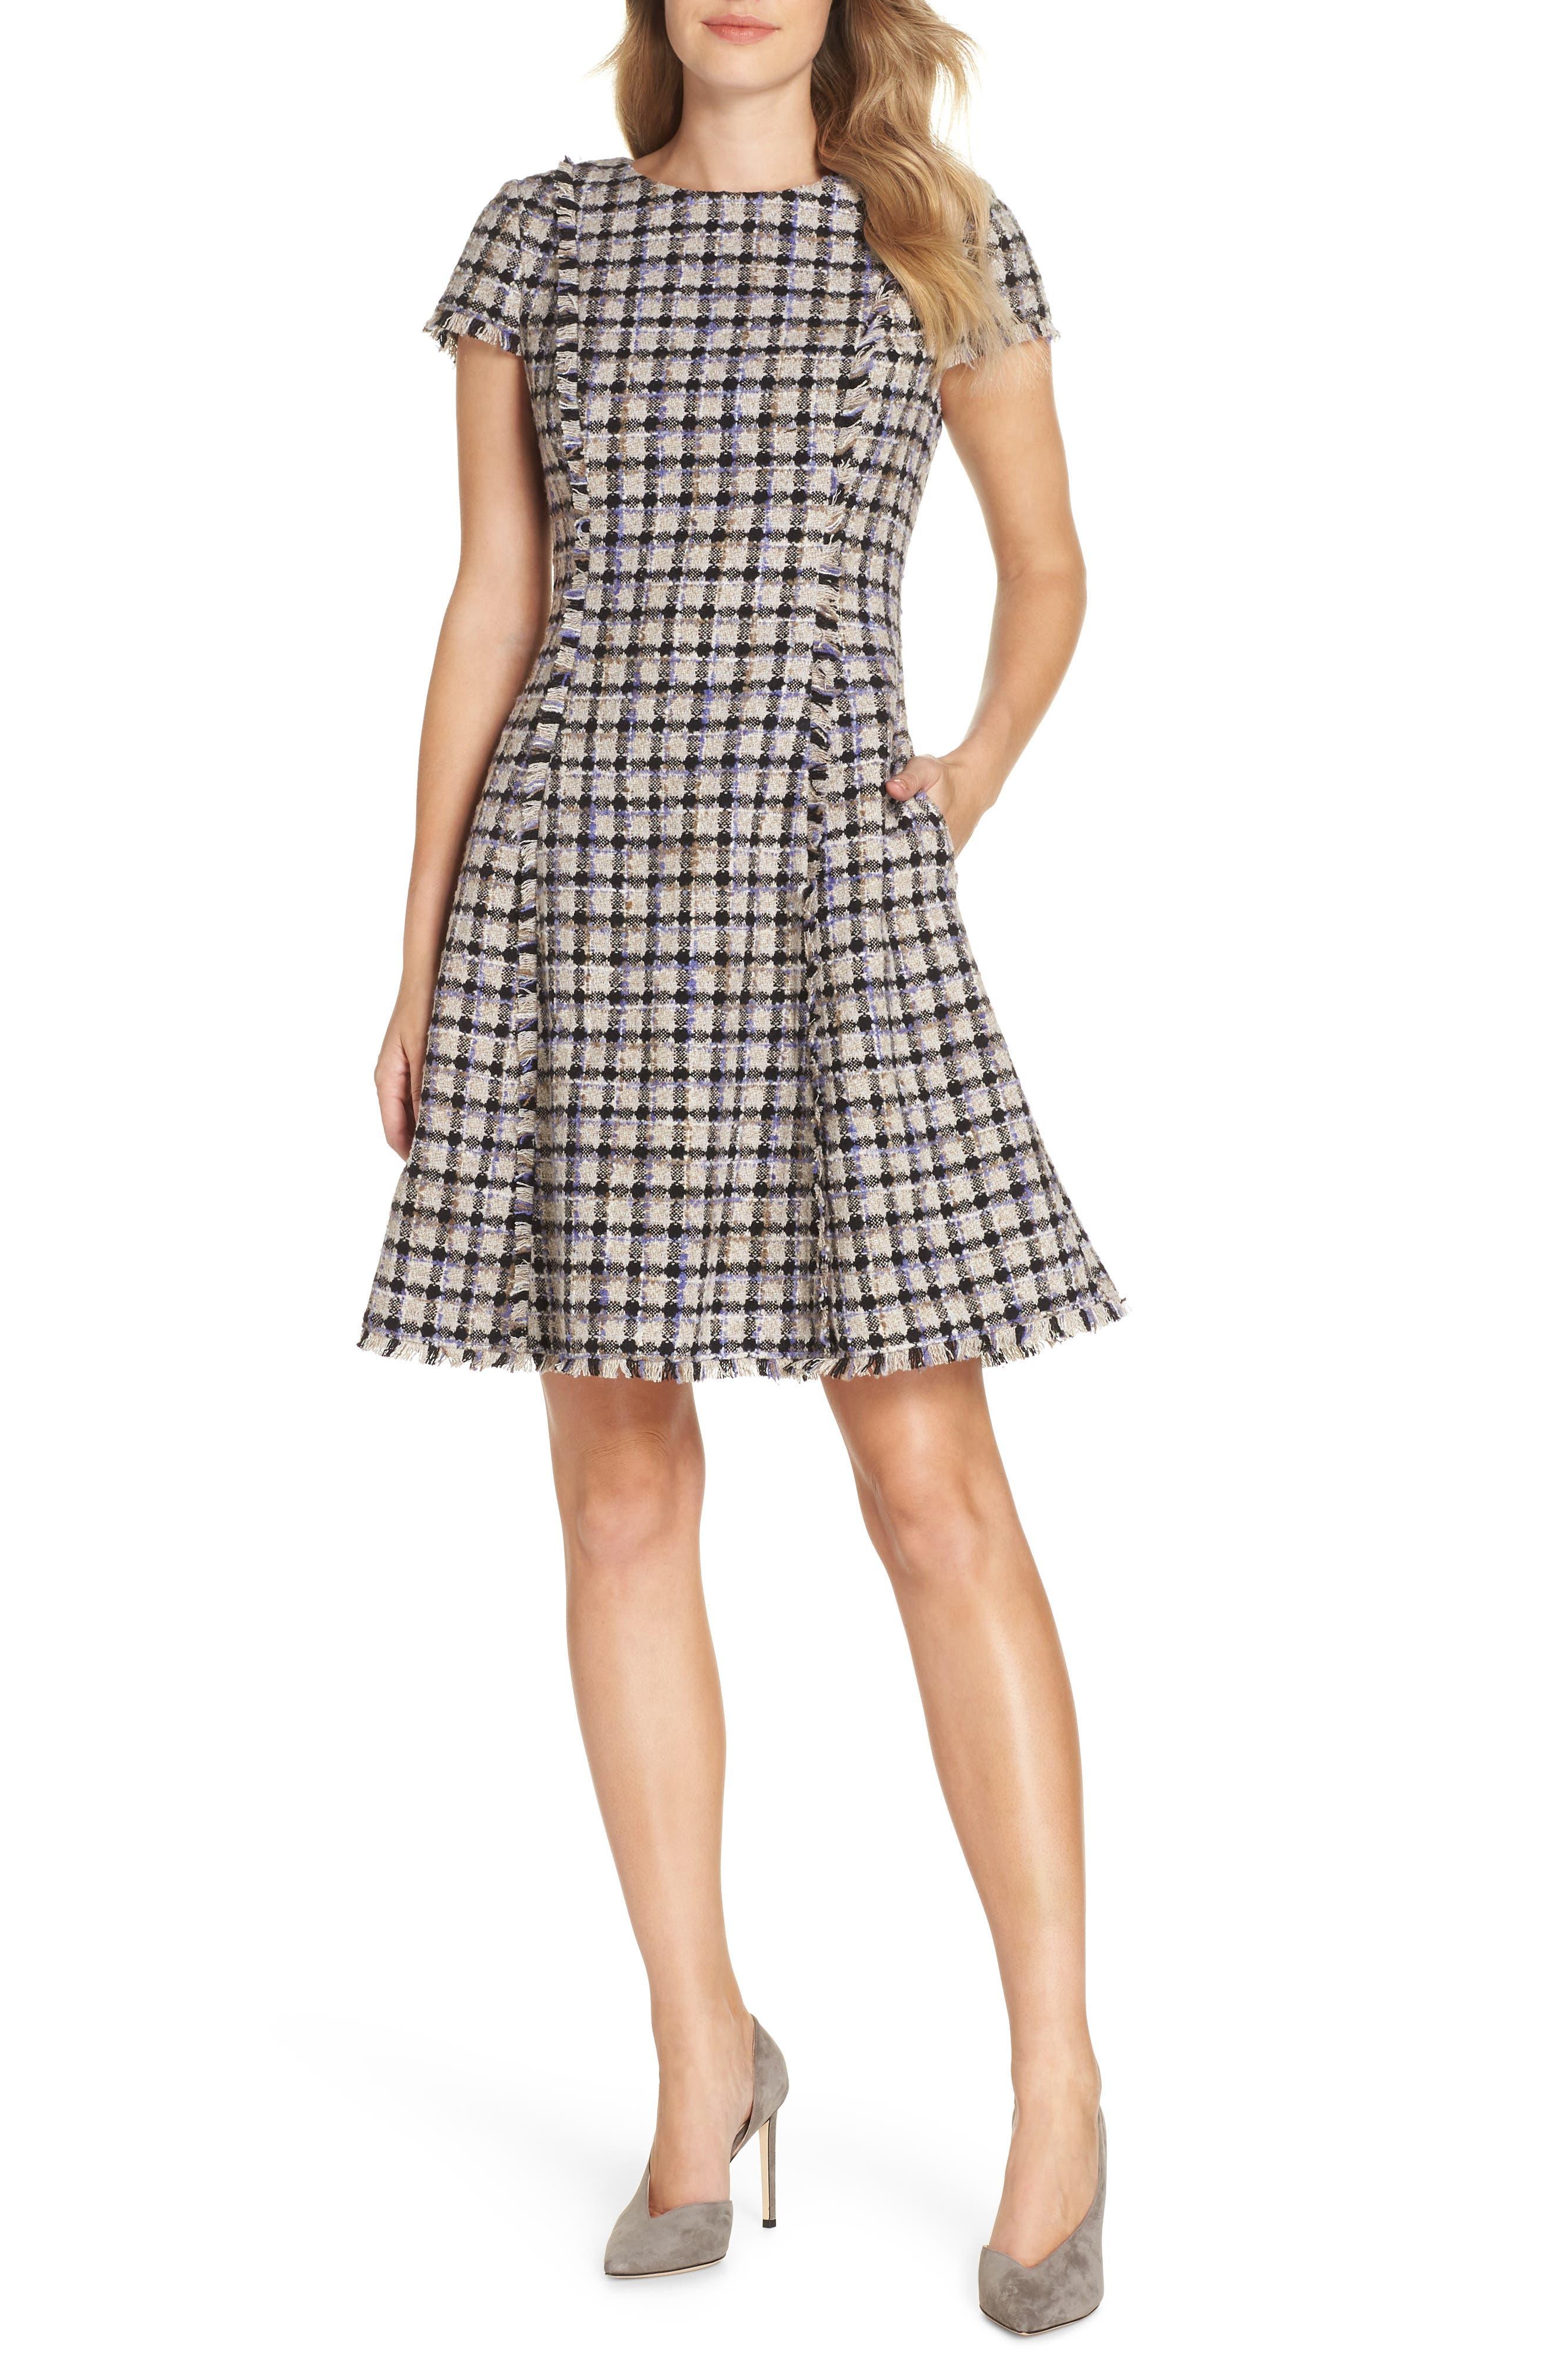 ELIZA J, Cap Sleeve Fit & Flare Dress, Main thumbnail 1, color, 900